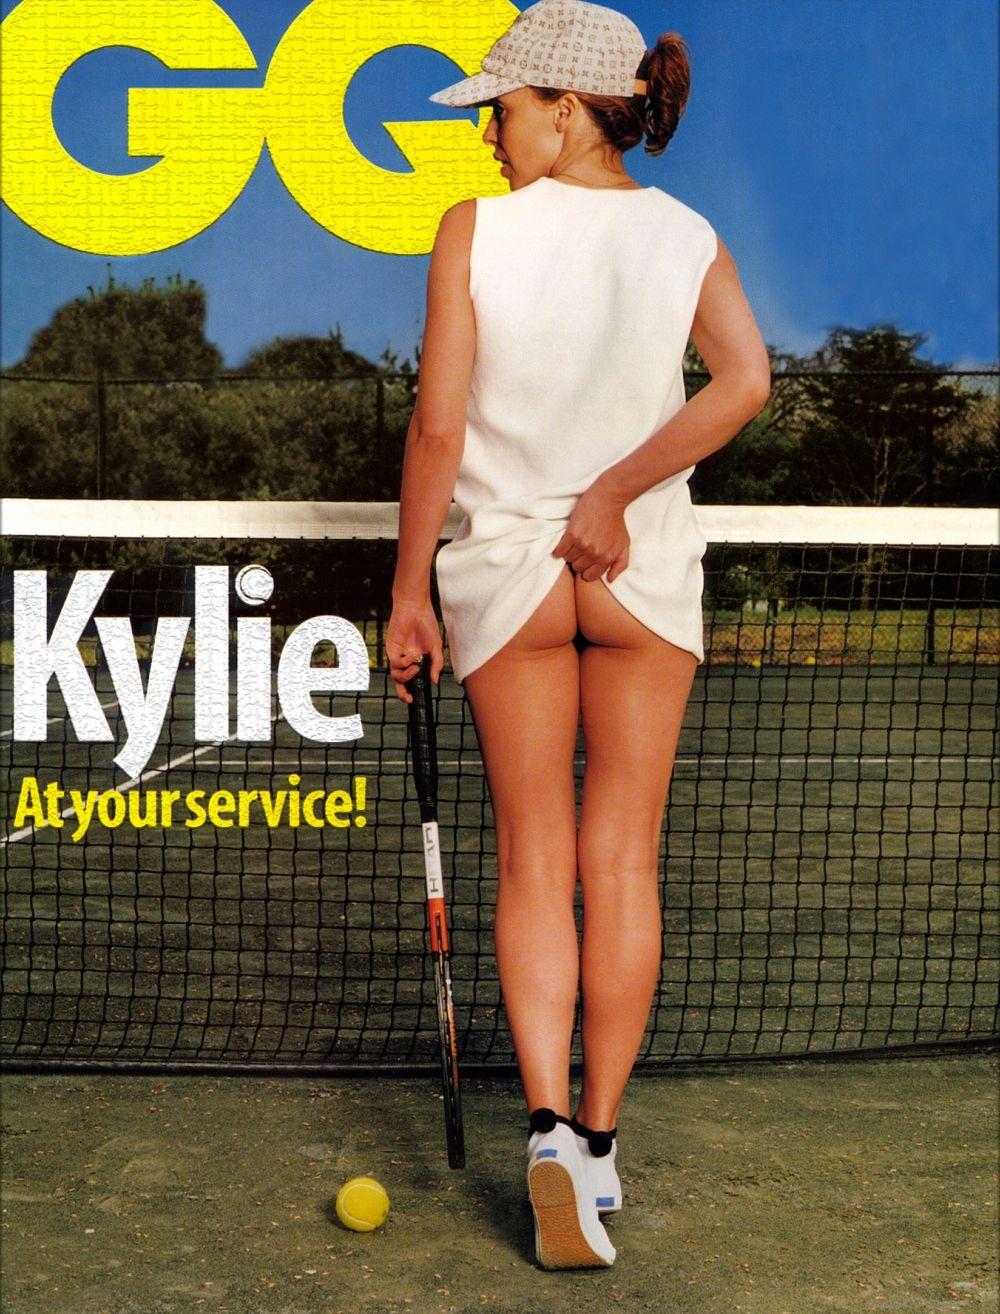 minogue tennis girl Kylie